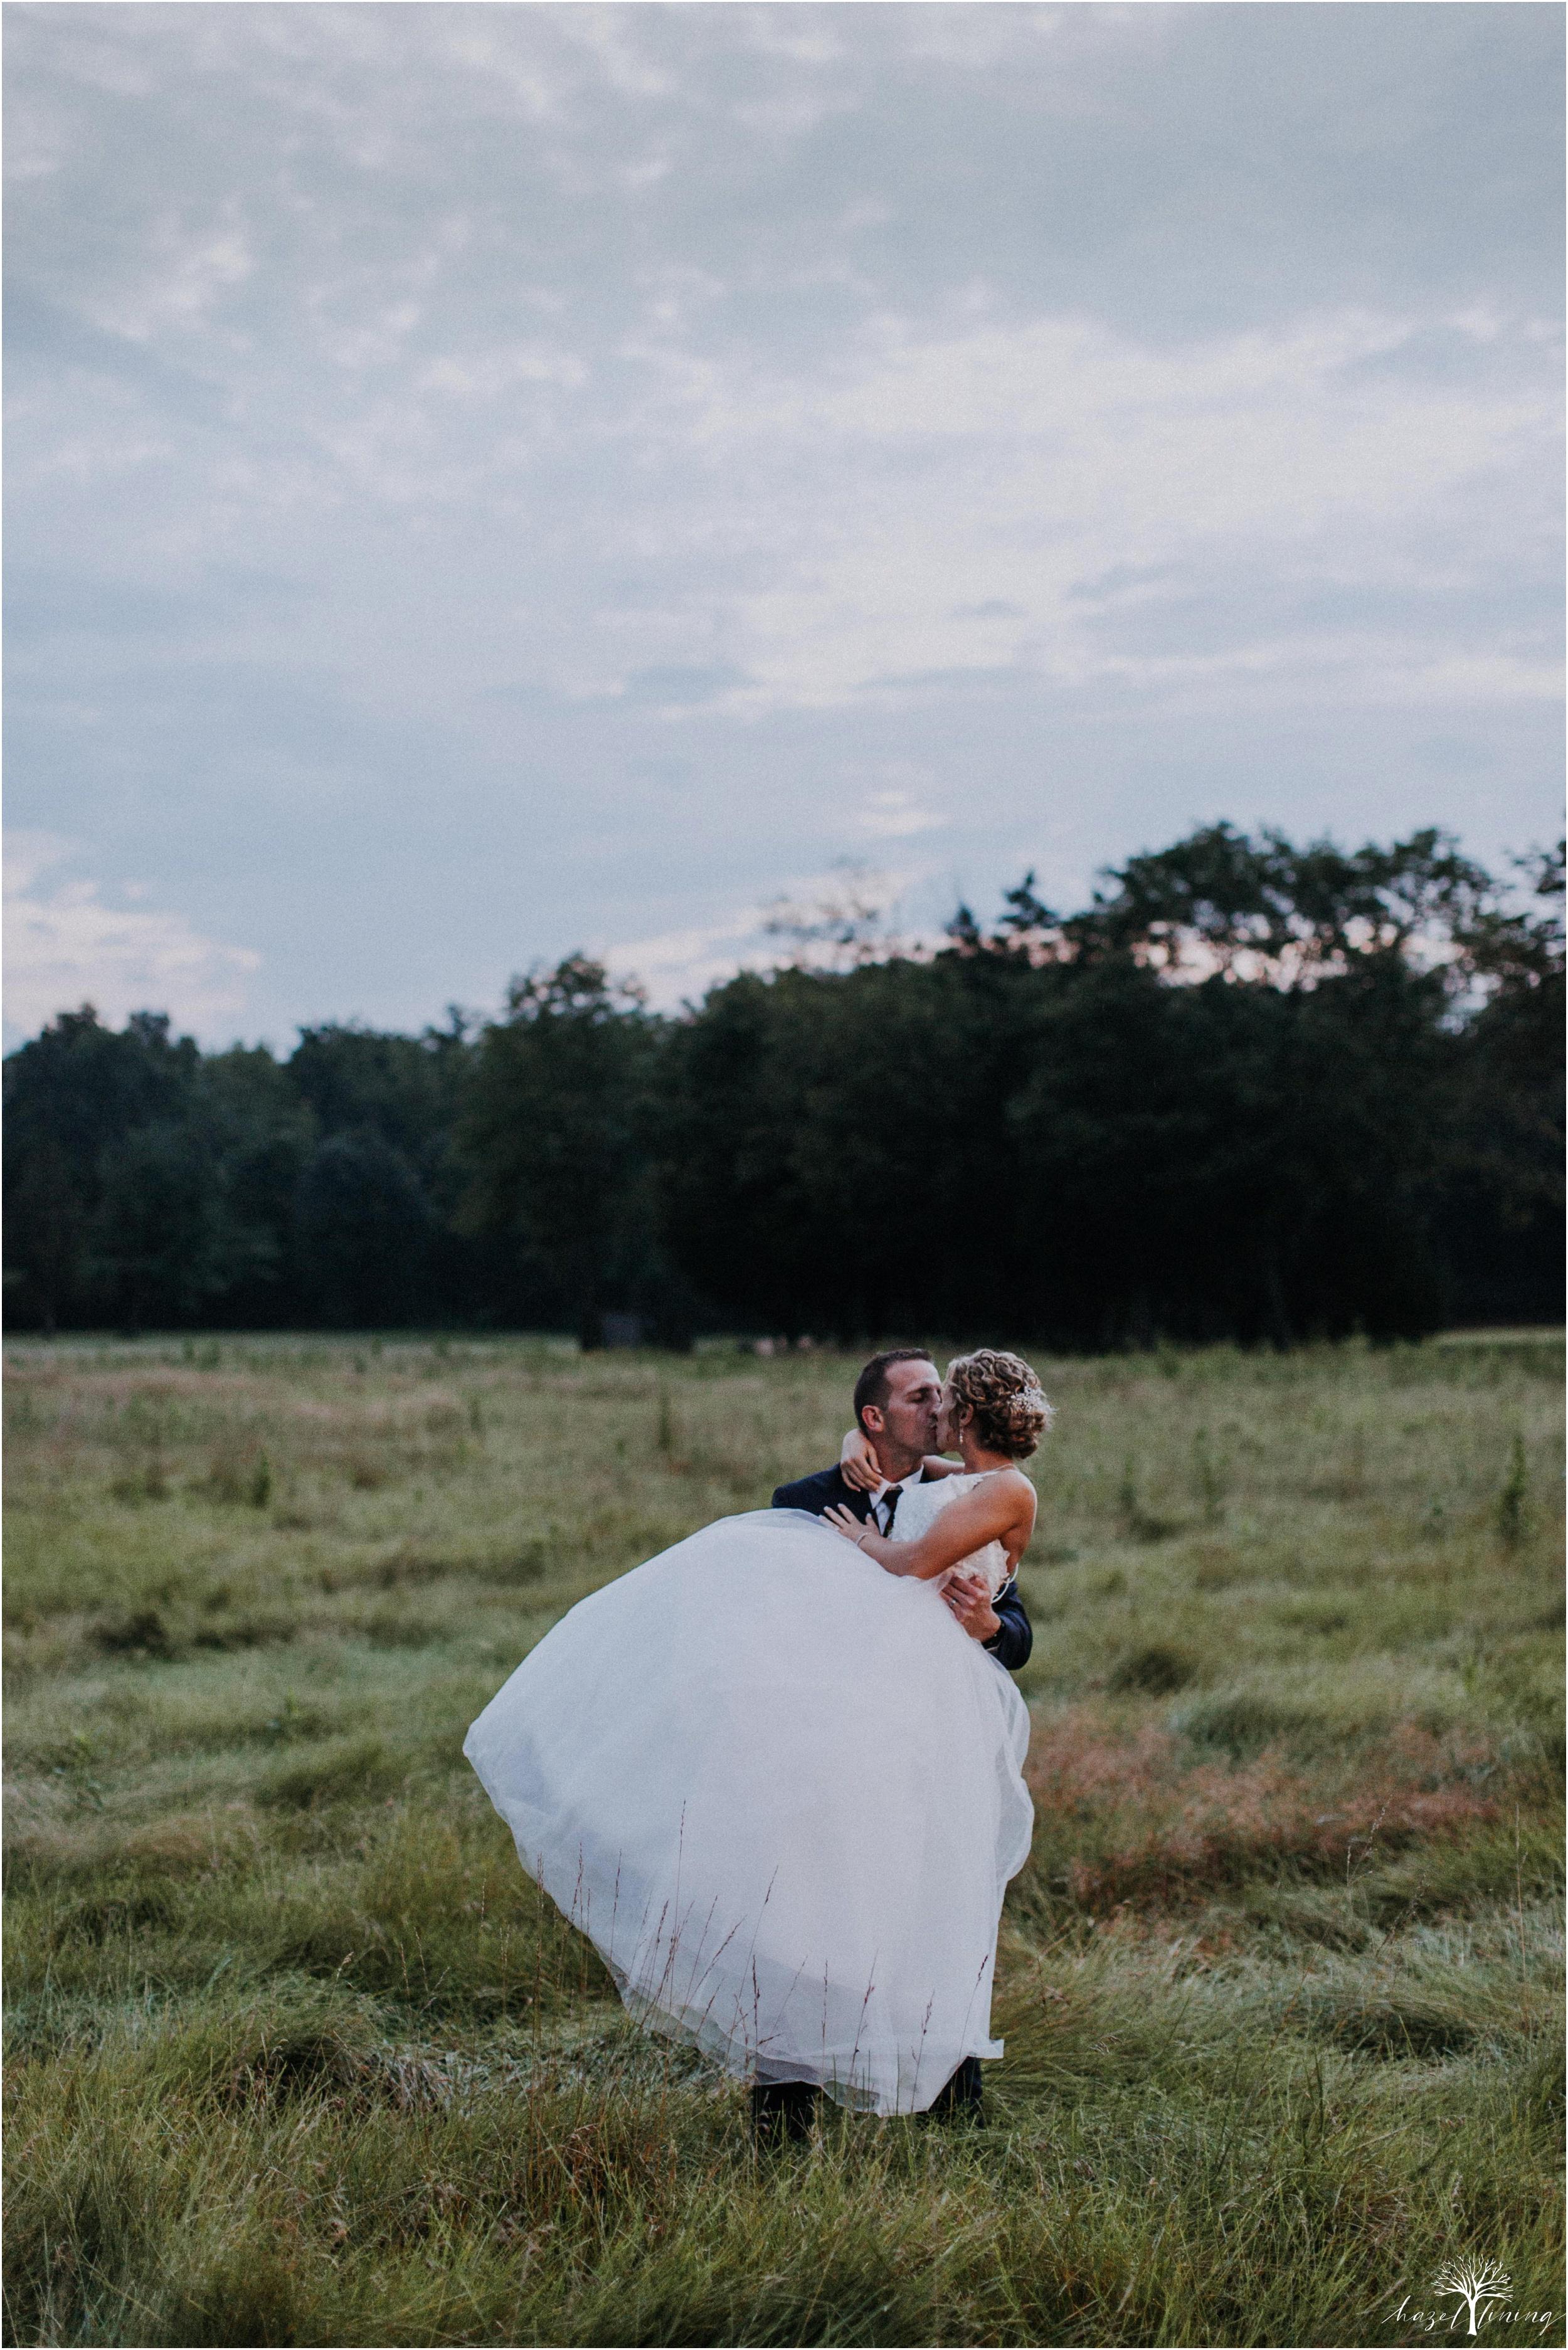 jonathan-weibel-becky-haywood-loft-at-sweetwater-cc-pennsburg-pennsylvania-rainy-day-summer-wedding-hazel-lining-travel-wedding-elopement-photography_0140.jpg